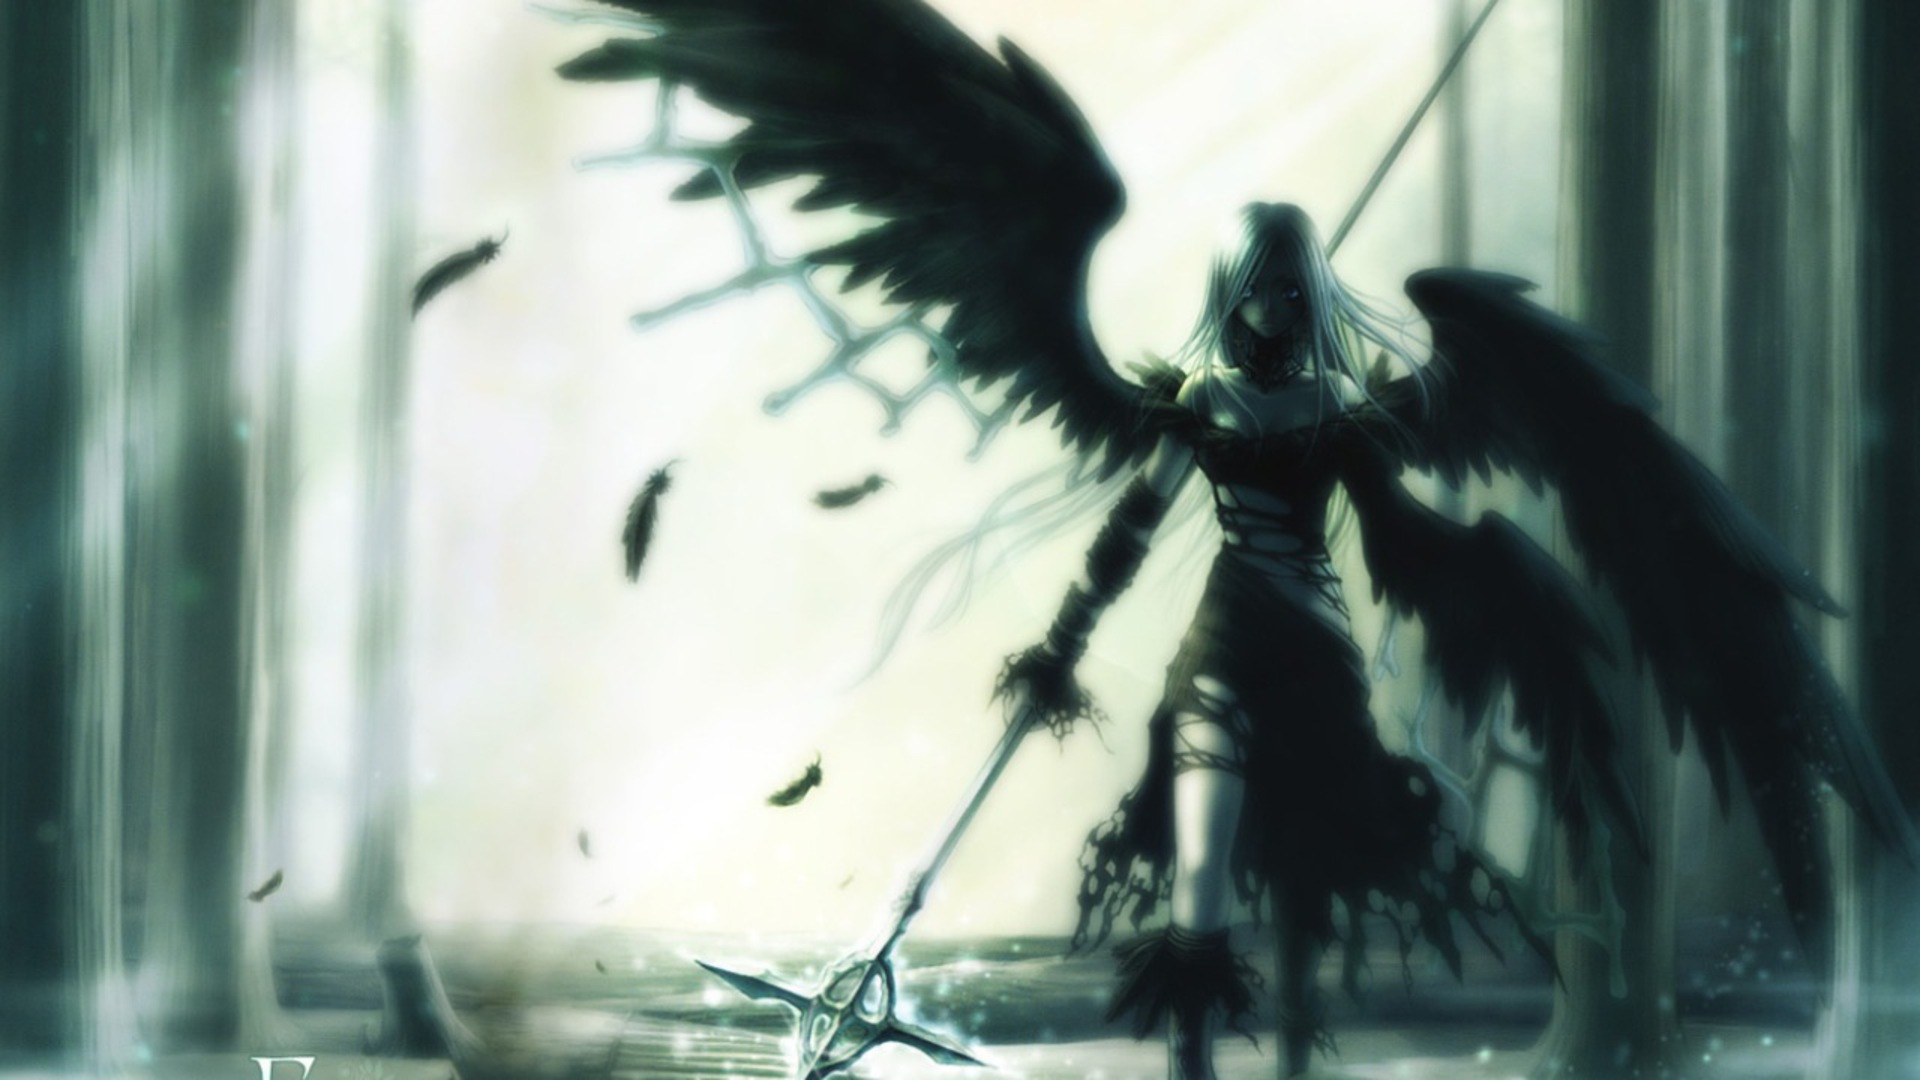 Download Wings Anime Wallpaper 1920x1080 Wallpoper 257243 1920x1080